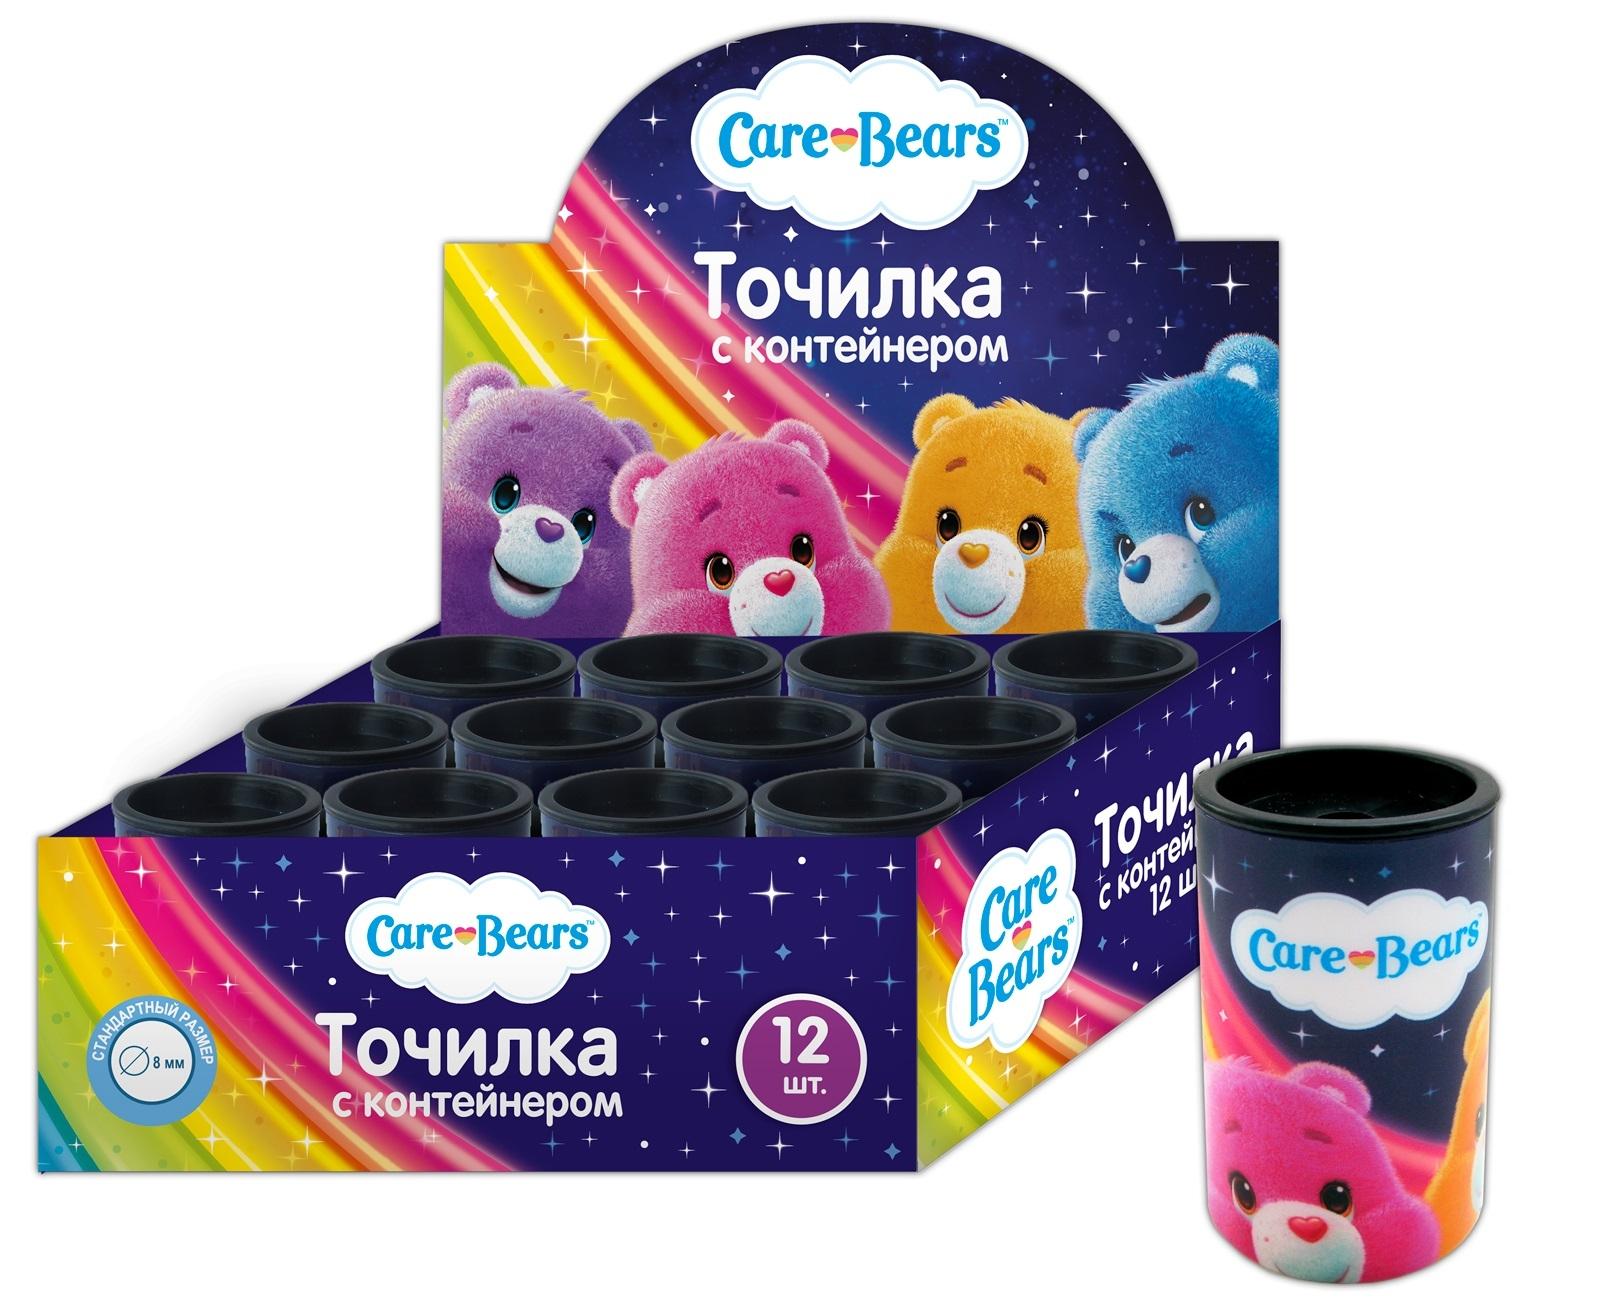 Точилка Care Bears с контейнером